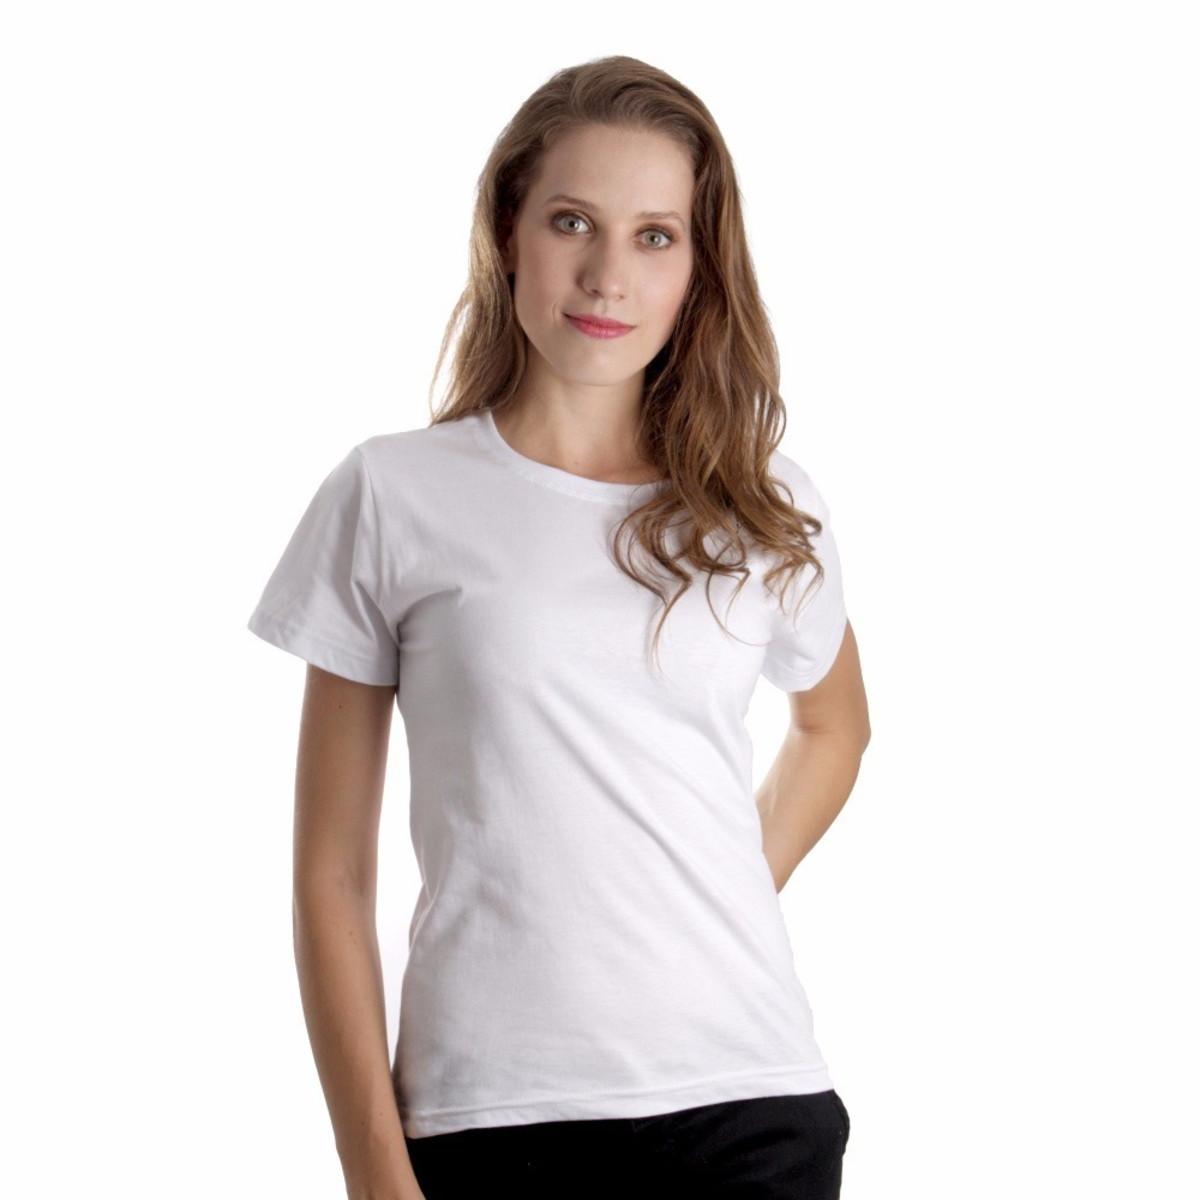 e71b35fc58268 Camiseta Baby Look Feminina 100% Algodão Lisa Camisa Branca no Elo7 ...